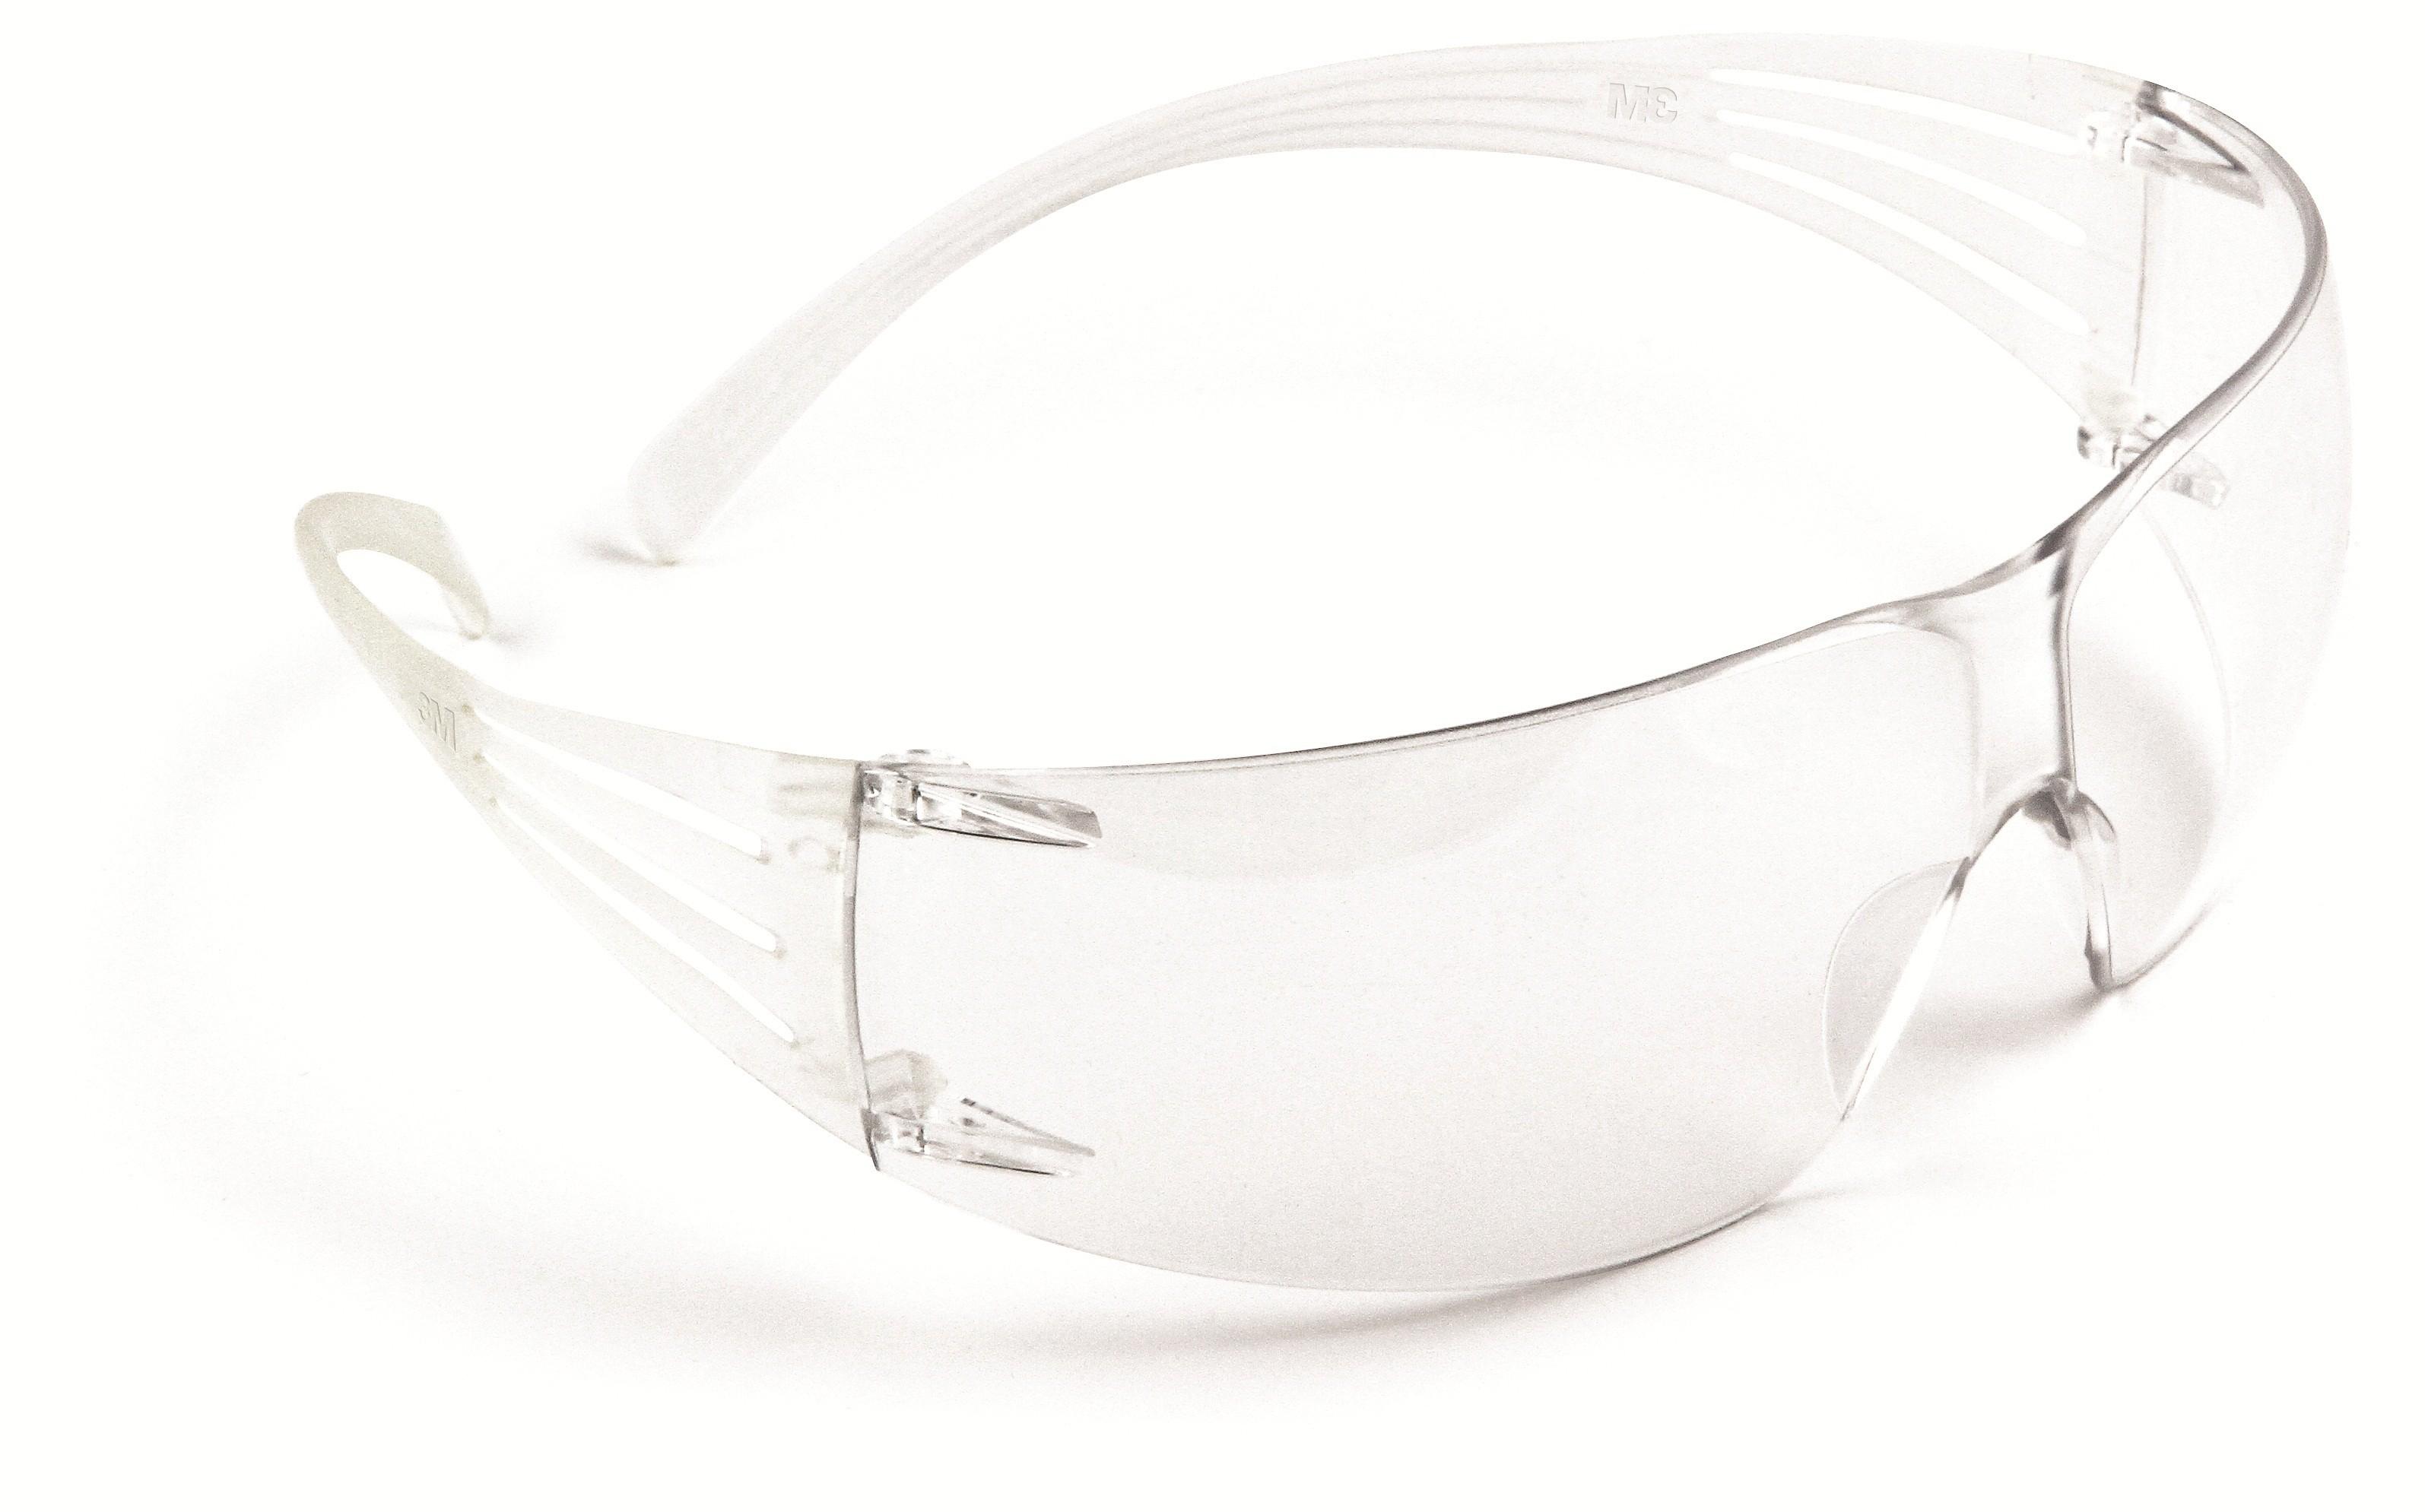 3m Securefit Sf200 Series Spectacles